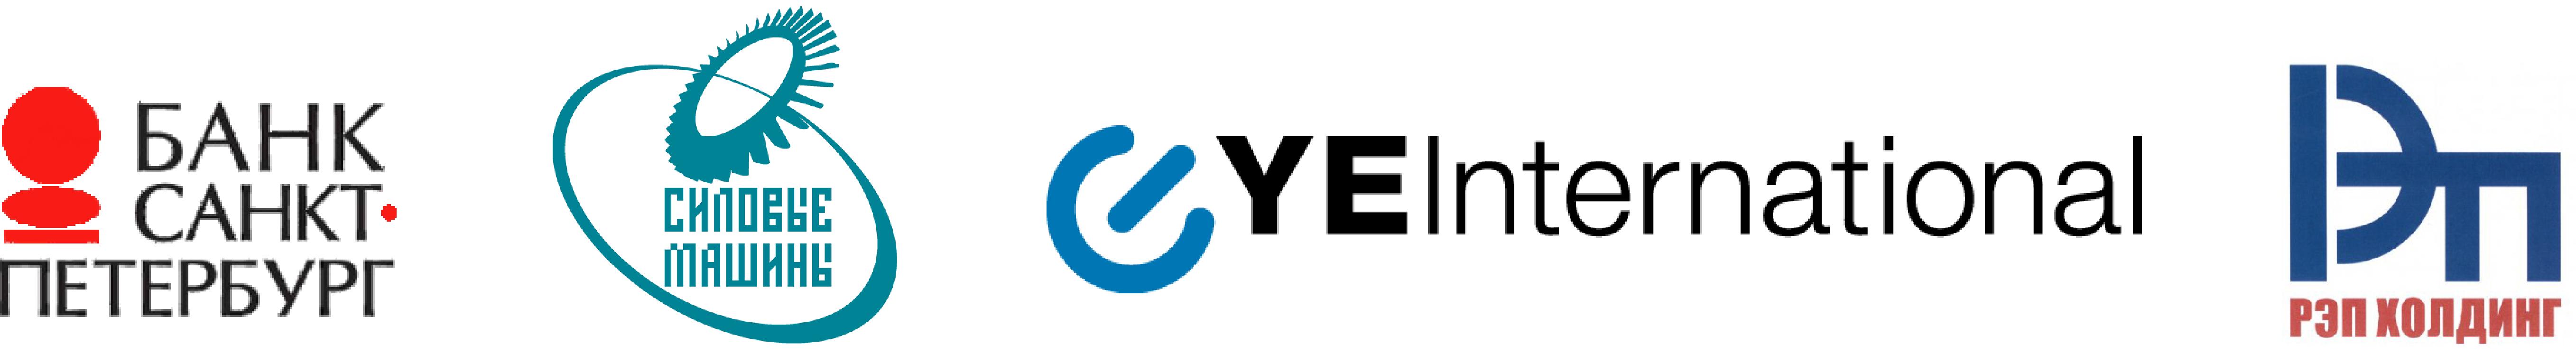 корпоративное обучение лого